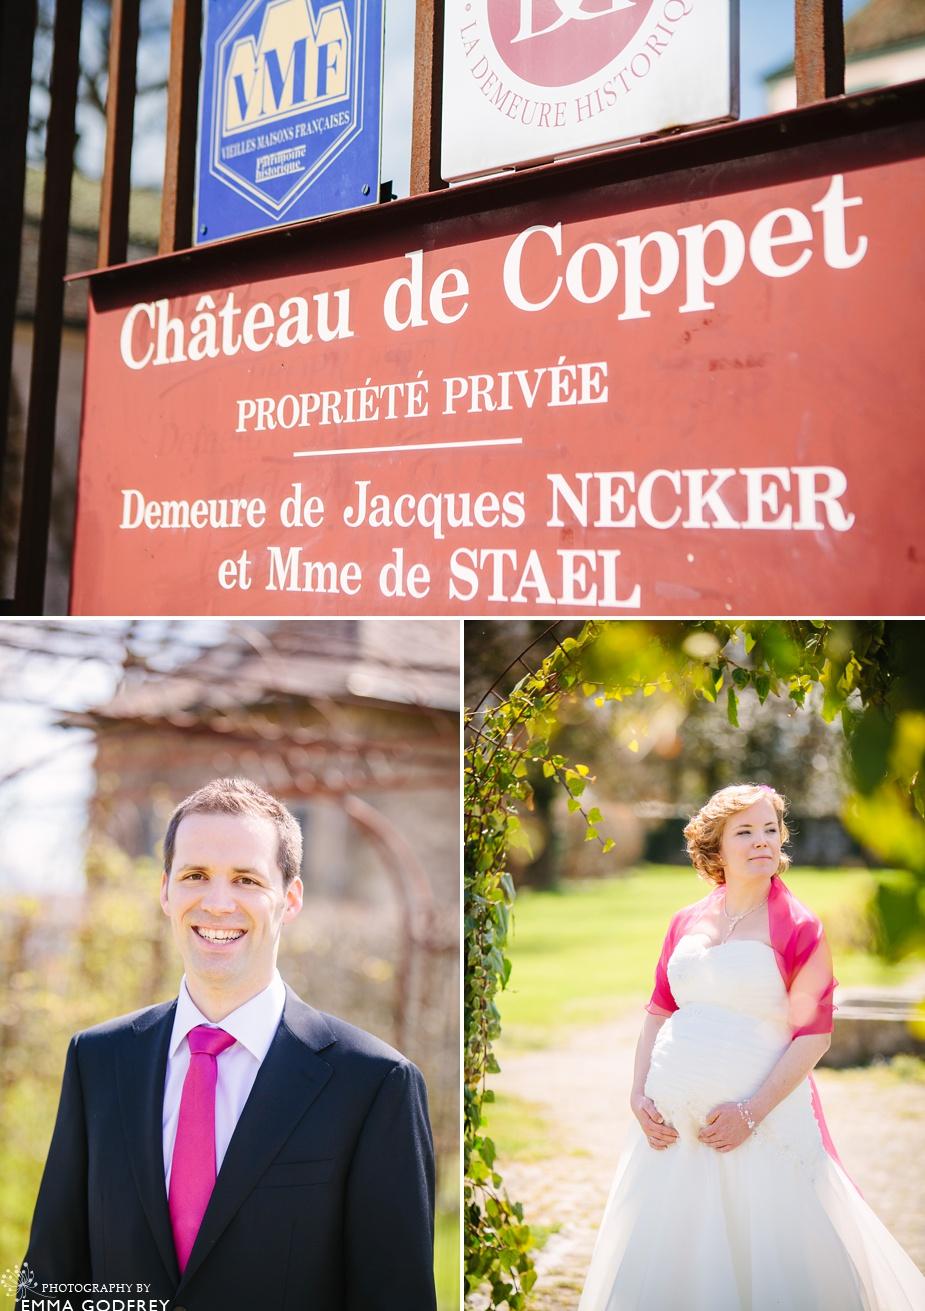 Coppet-Wedding-13.jpg